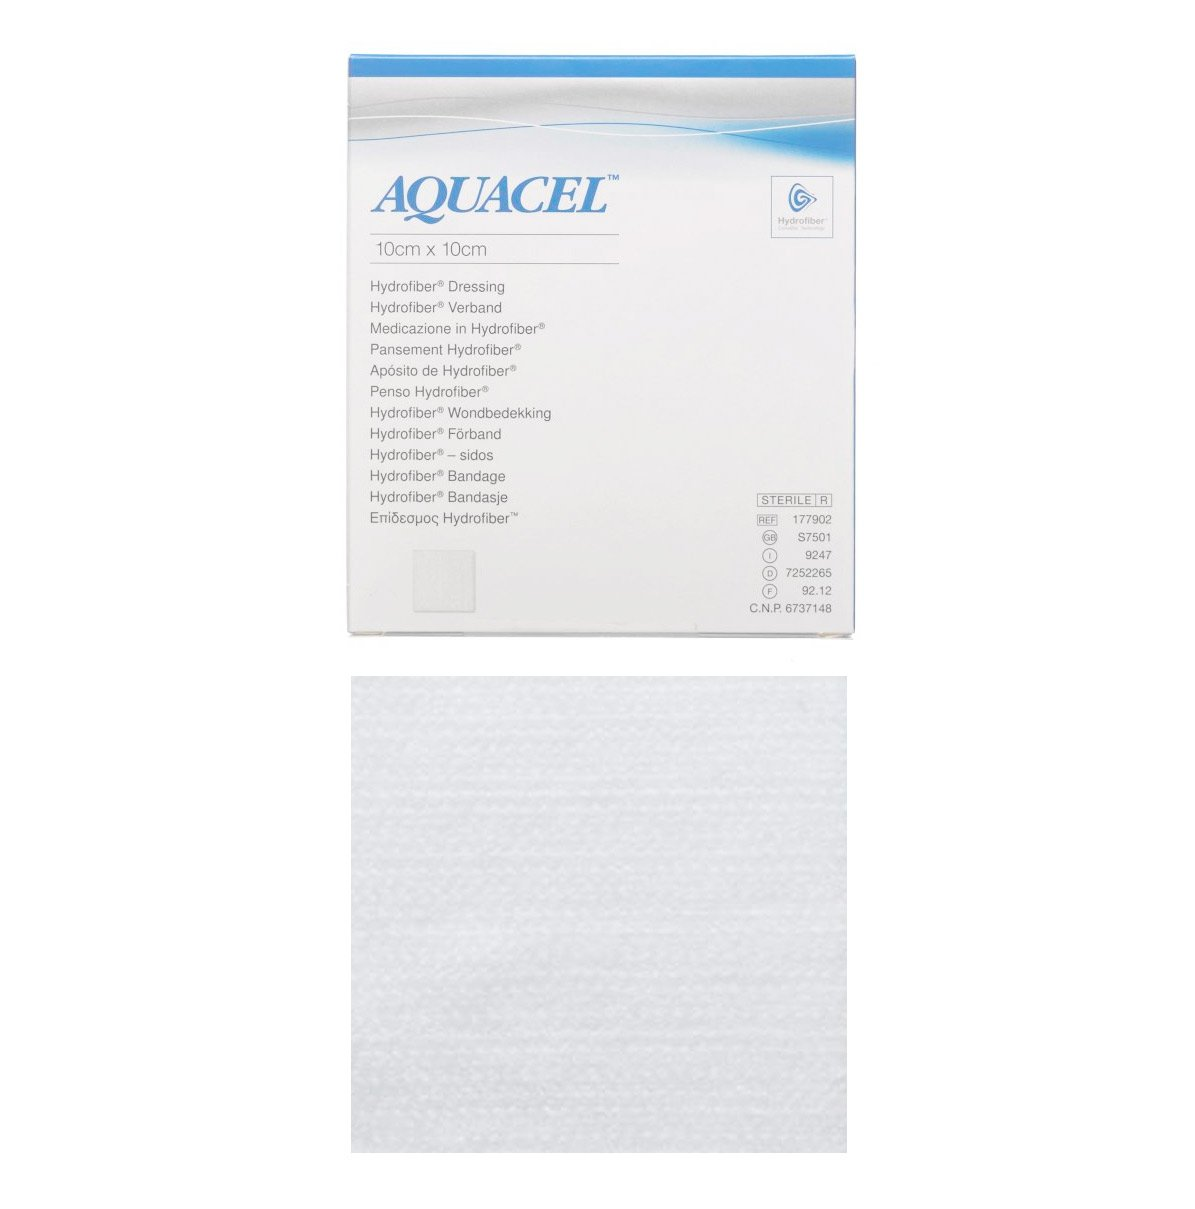 Aquacel Hydrofiber 10 x 10m